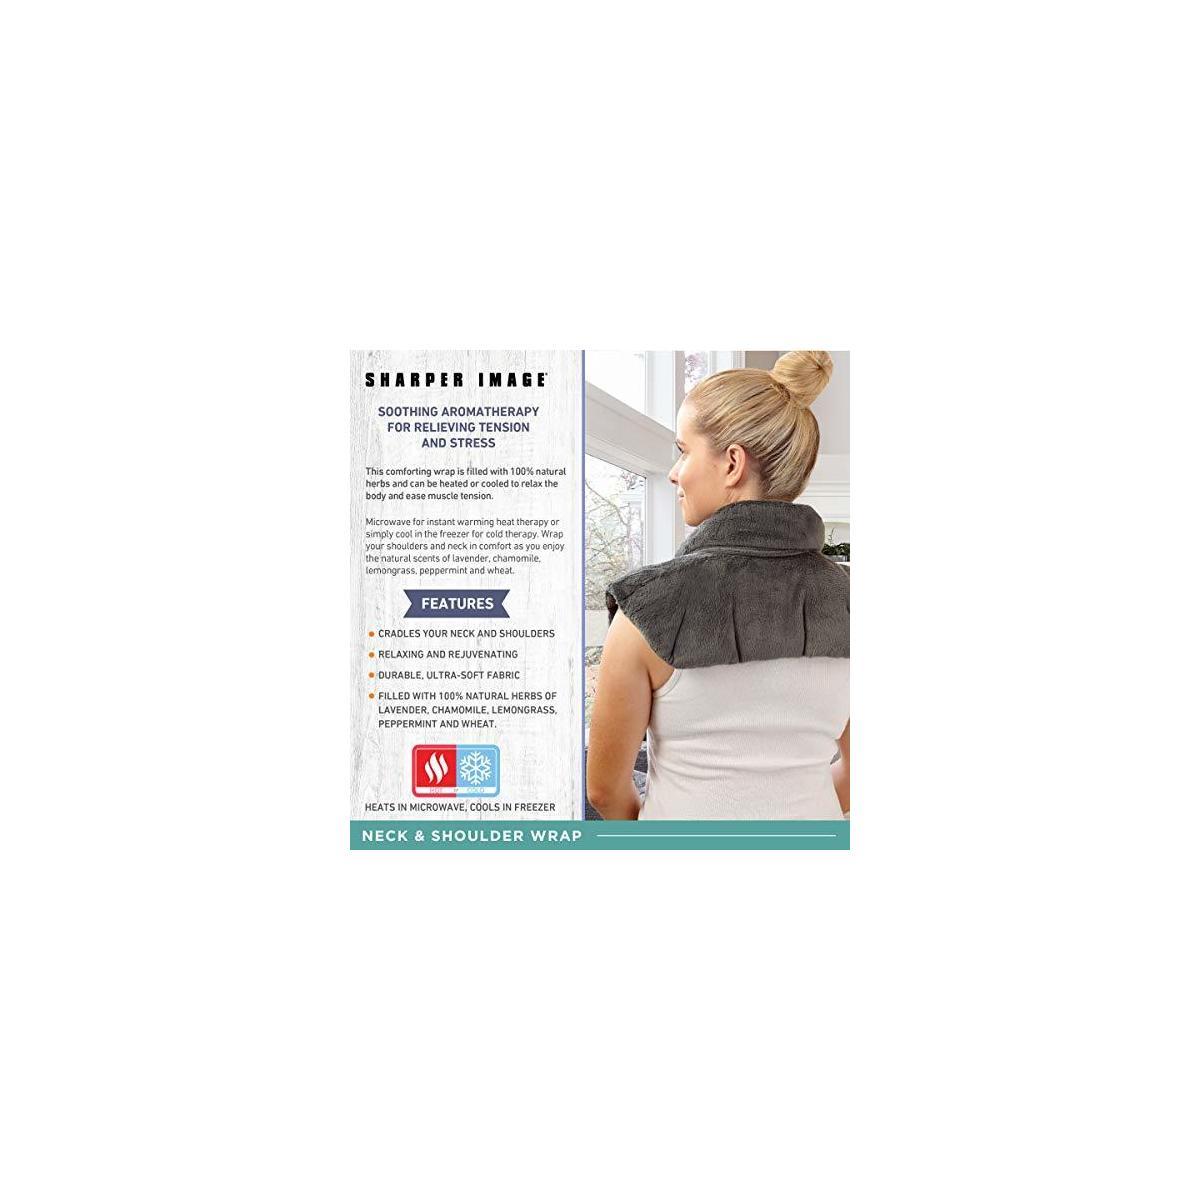 SHARPER IMAGE Hot & Cold Herbal Aromatherapy Neck & Shoulder Plush Wrap - Grey